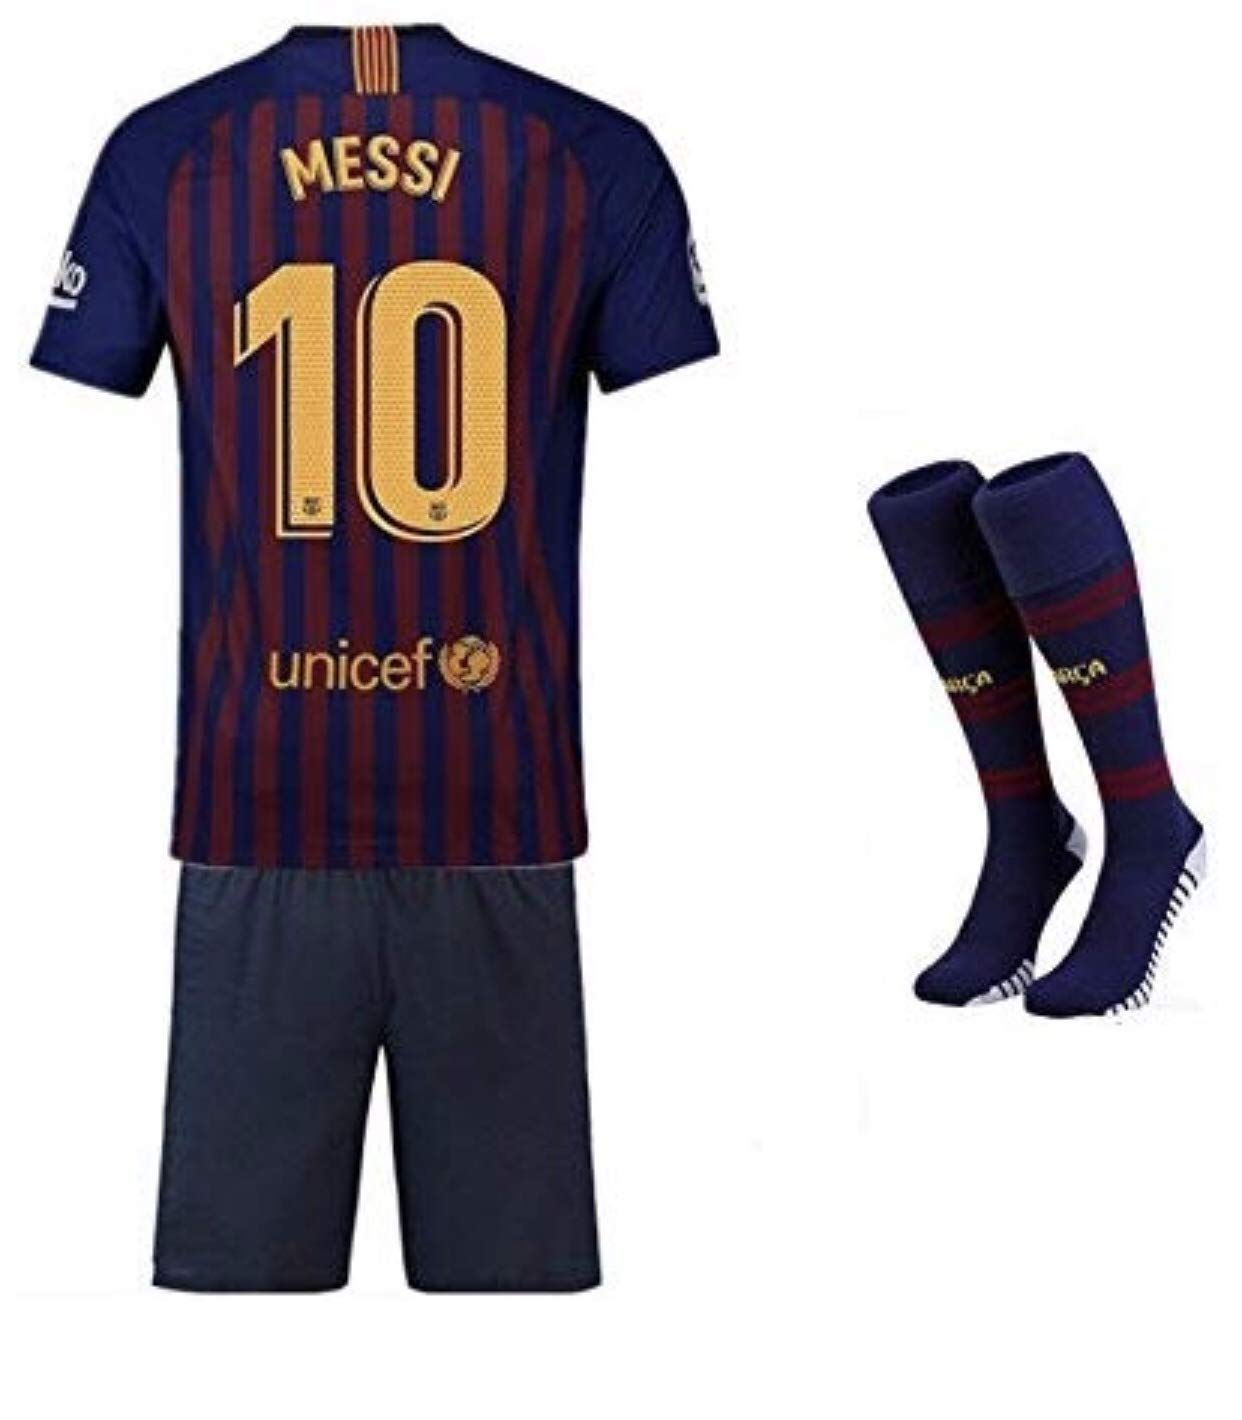 new product 43b12 65434 Replica Barcelona 2018/19 Newest Kids kit - MESSI